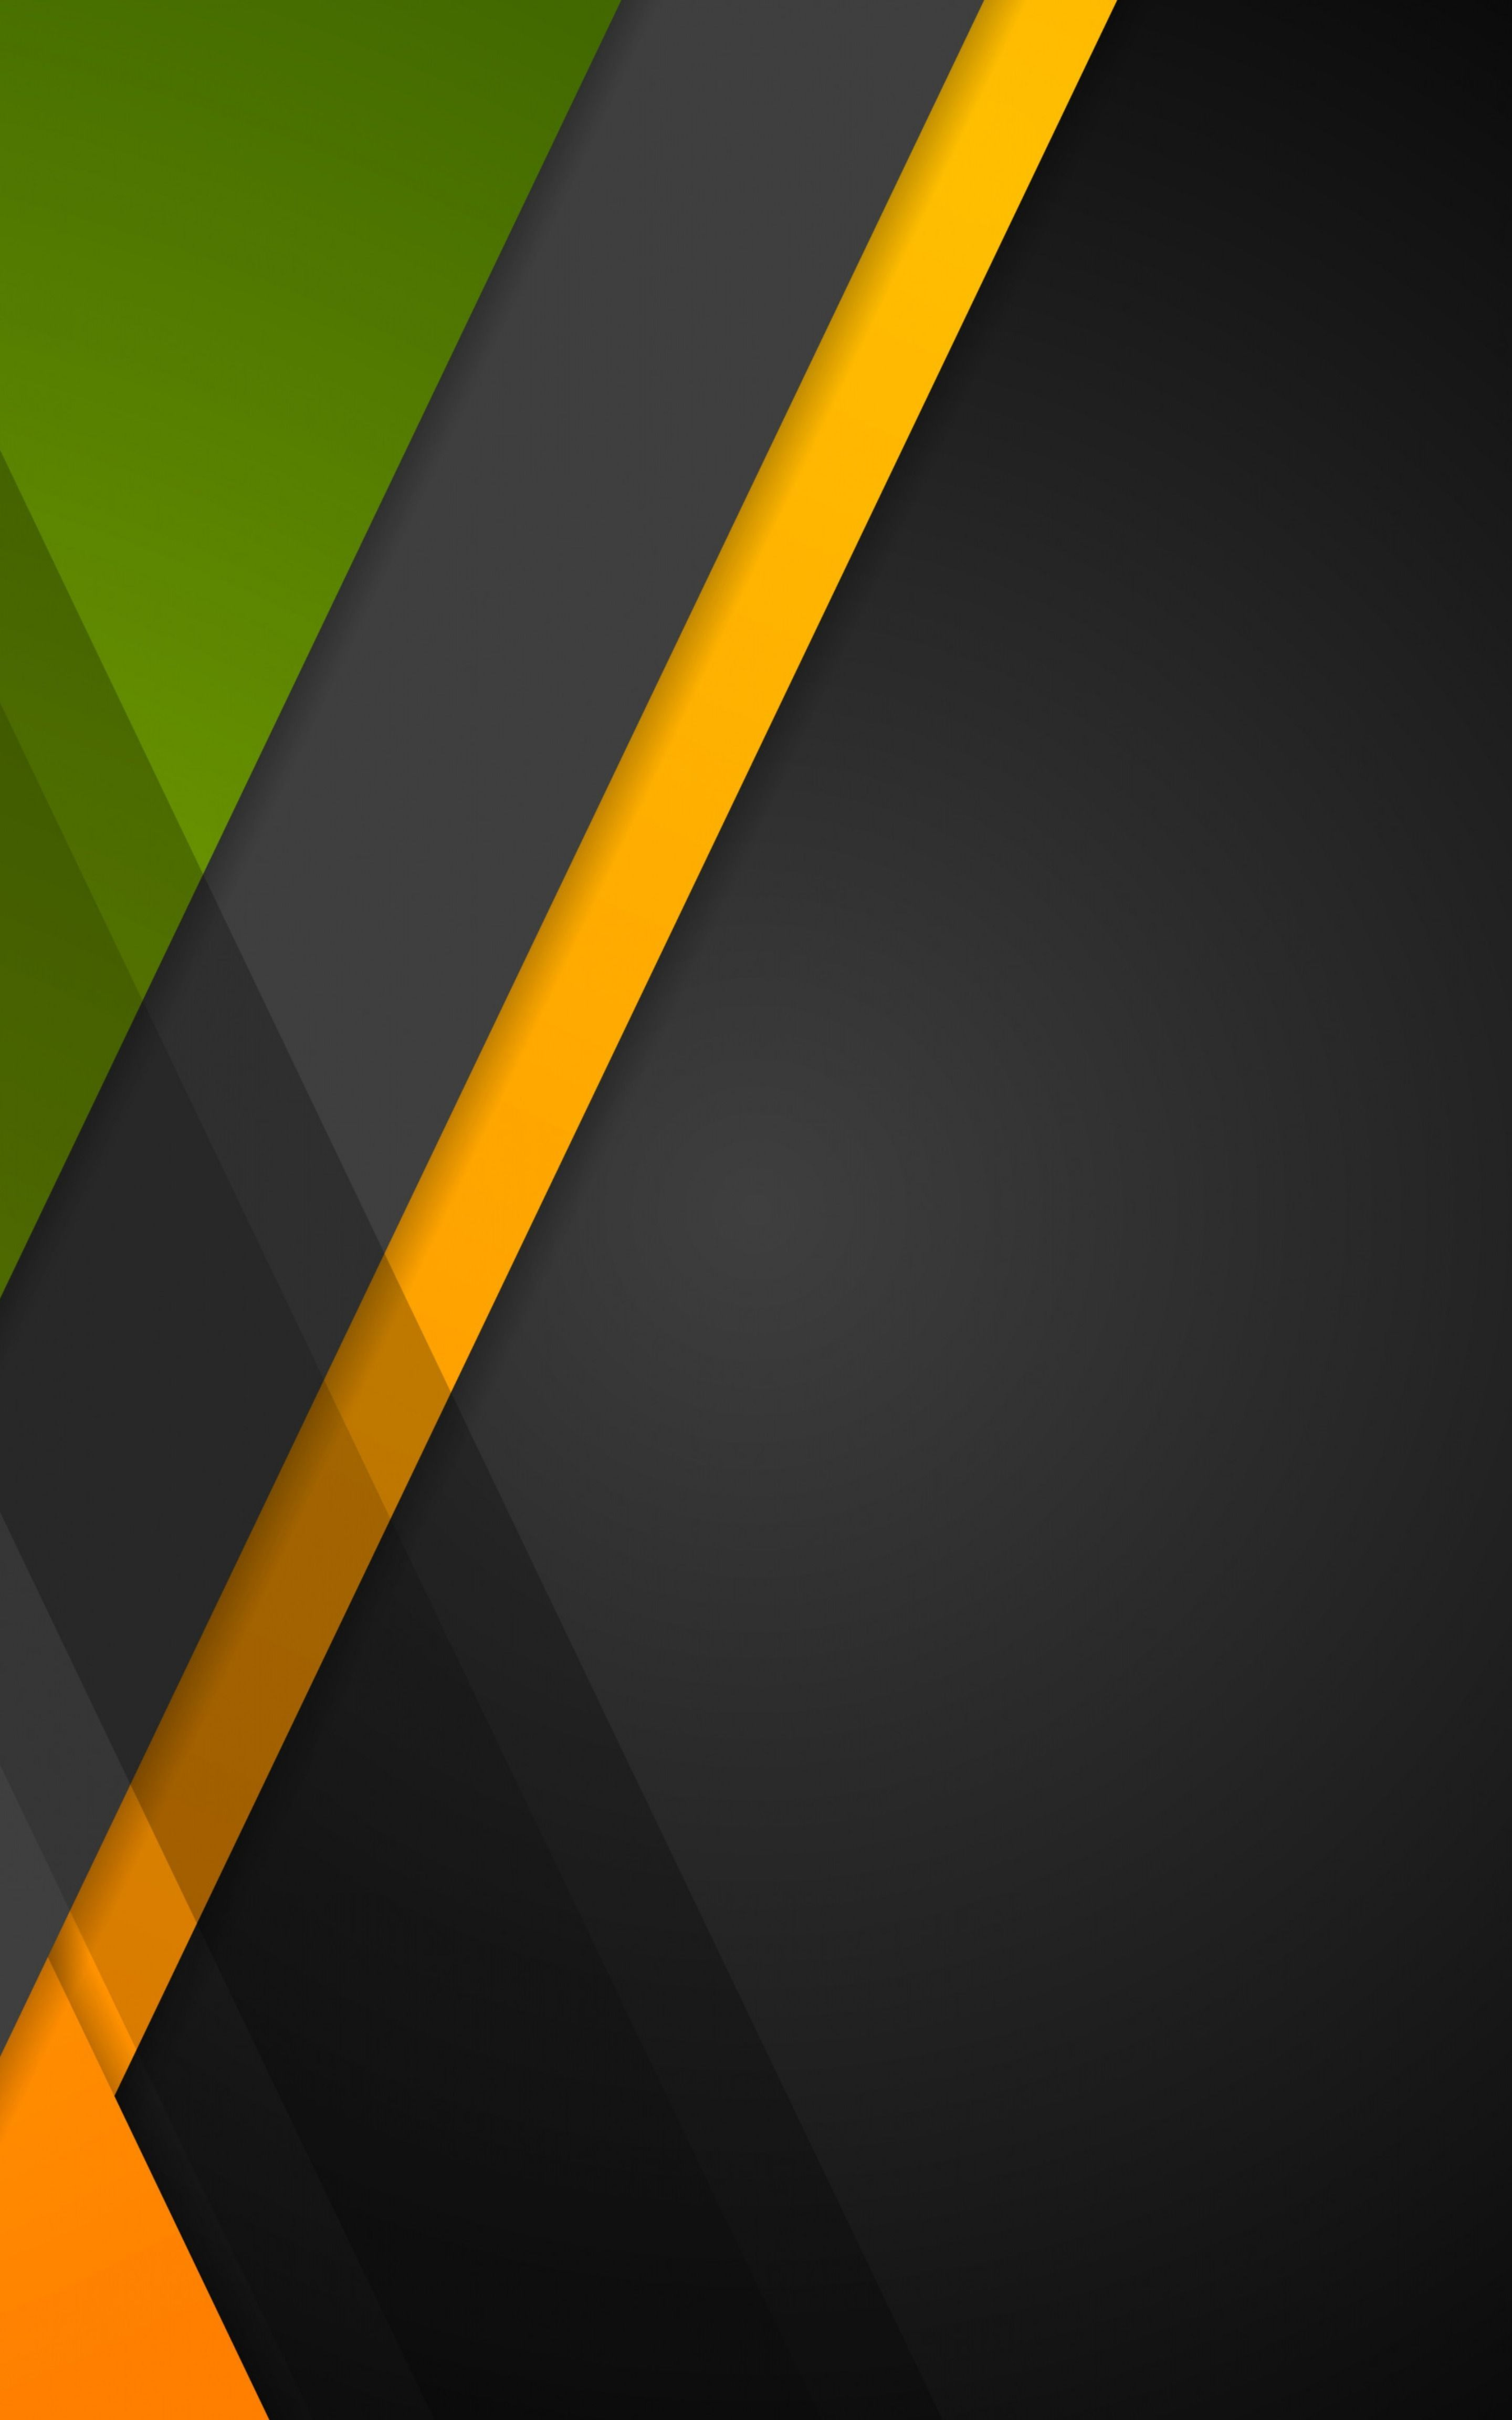 Green And Black Wallpaper 4k